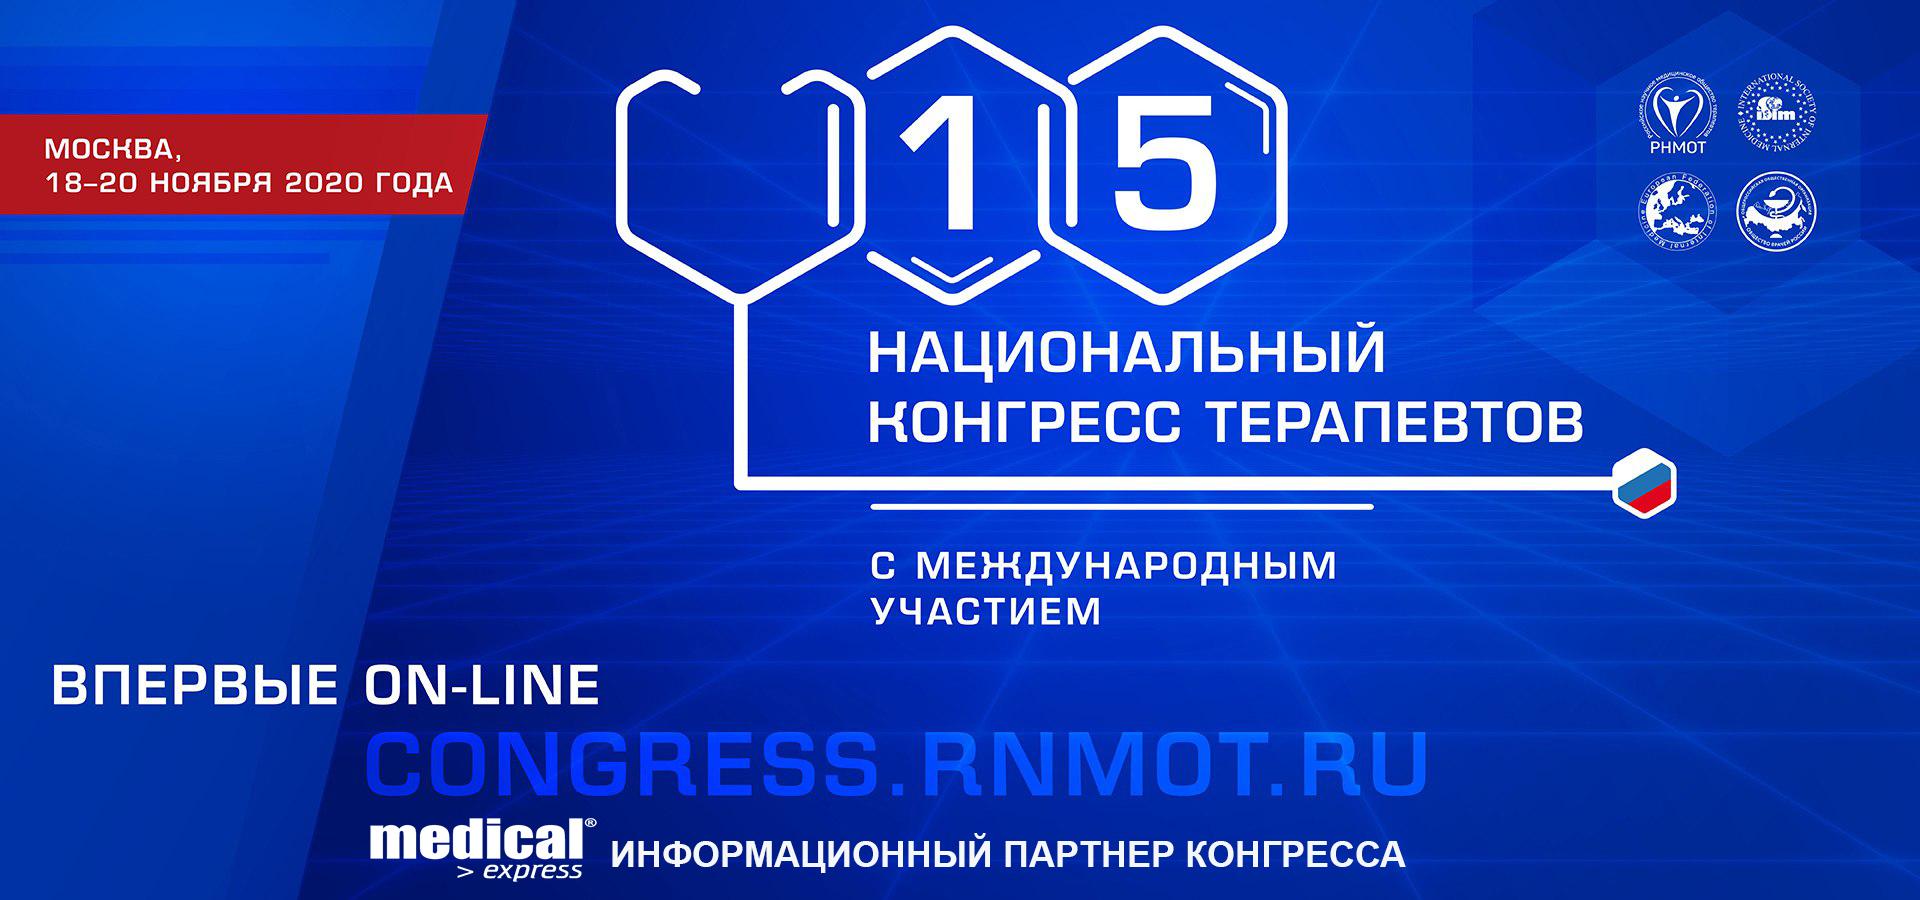 http://medicalexpress.ru/uploads/banners/photo5190764454969716903.jpg